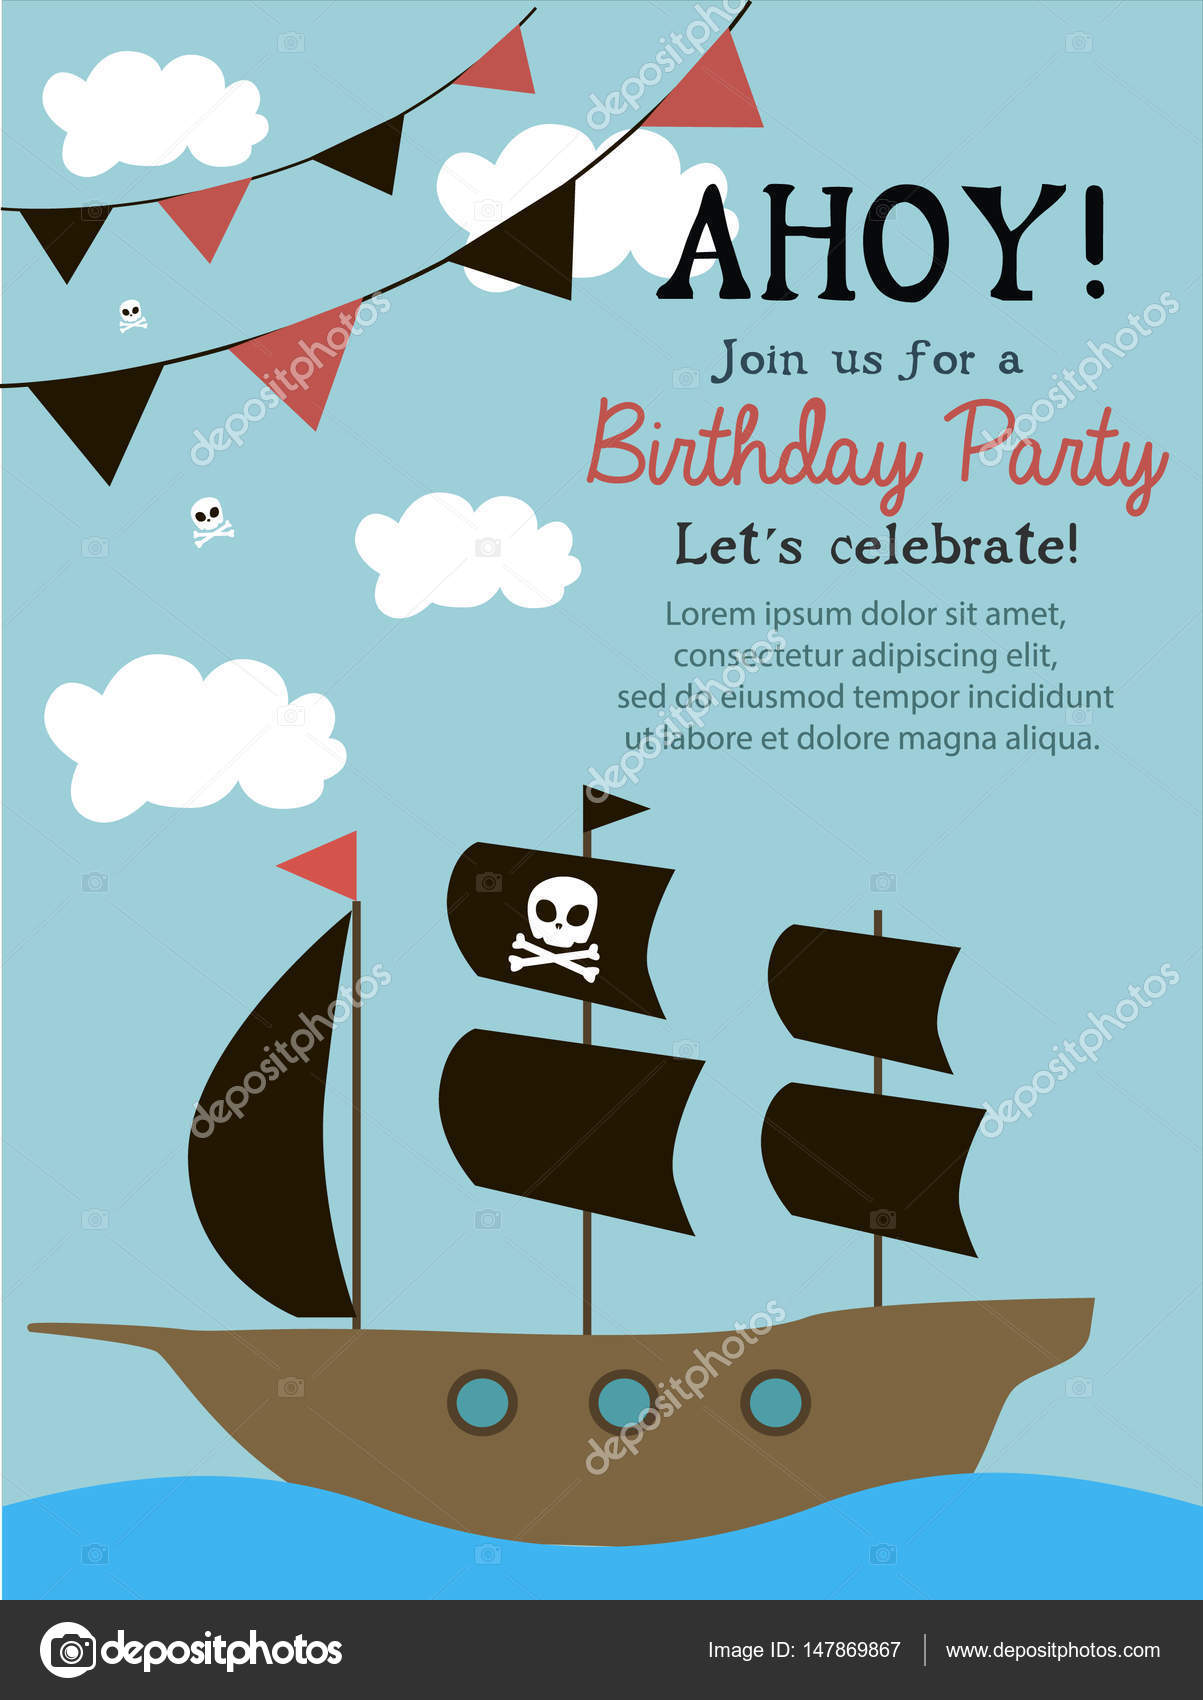 Pirate happy birthday invitation card stock vector vissay 147869867 pirate happy birthday invitation card stock vector stopboris Image collections